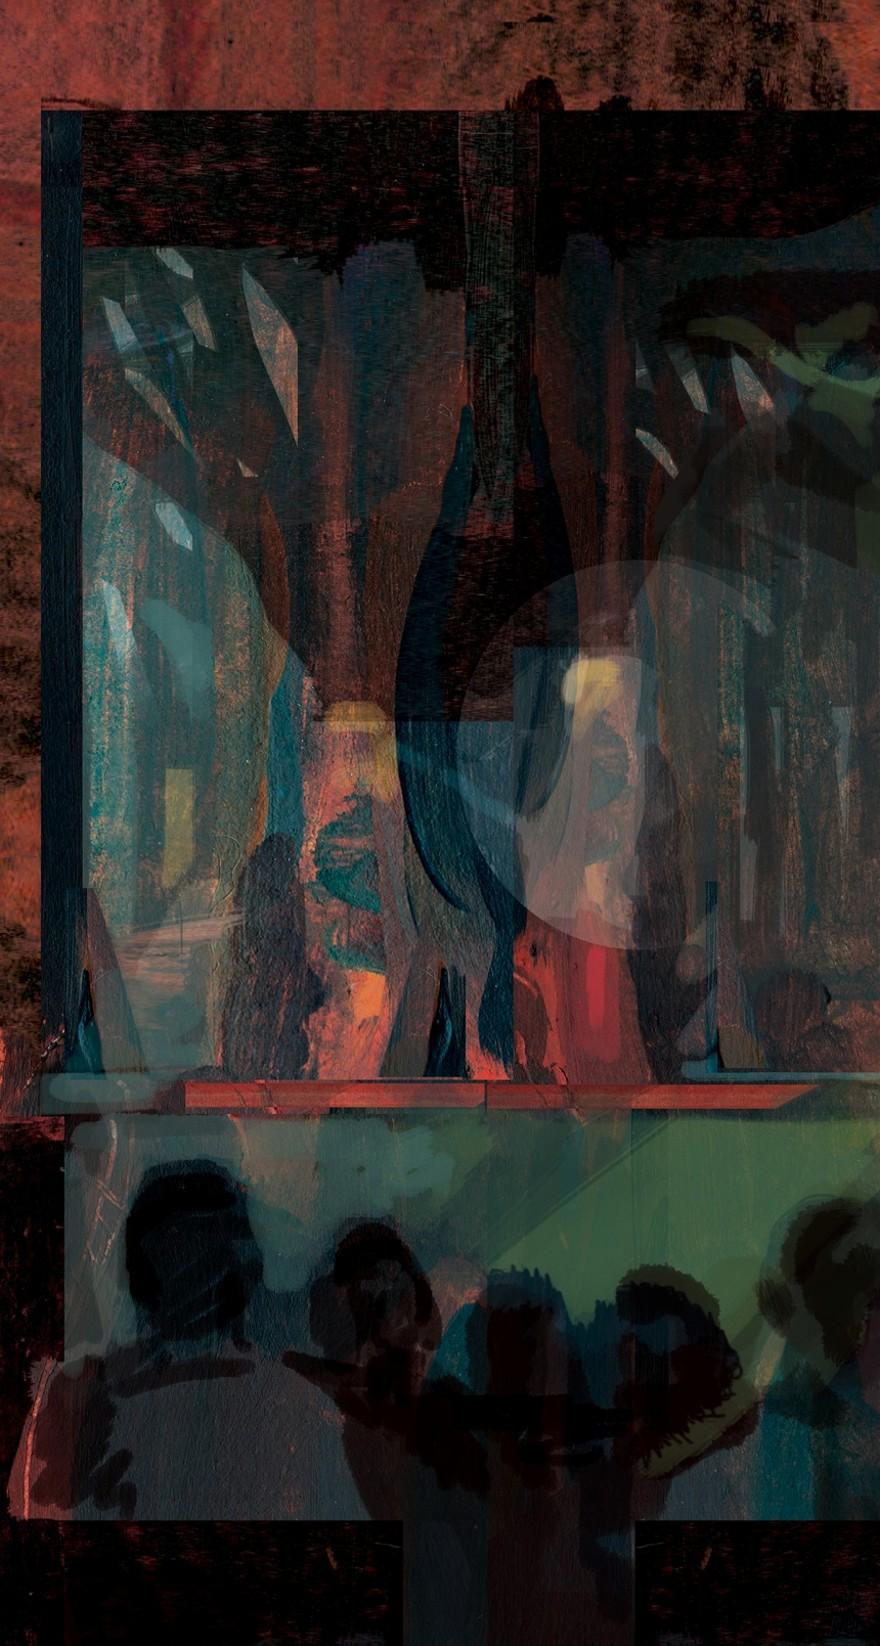 illustrazioni-joseph-murphy-8